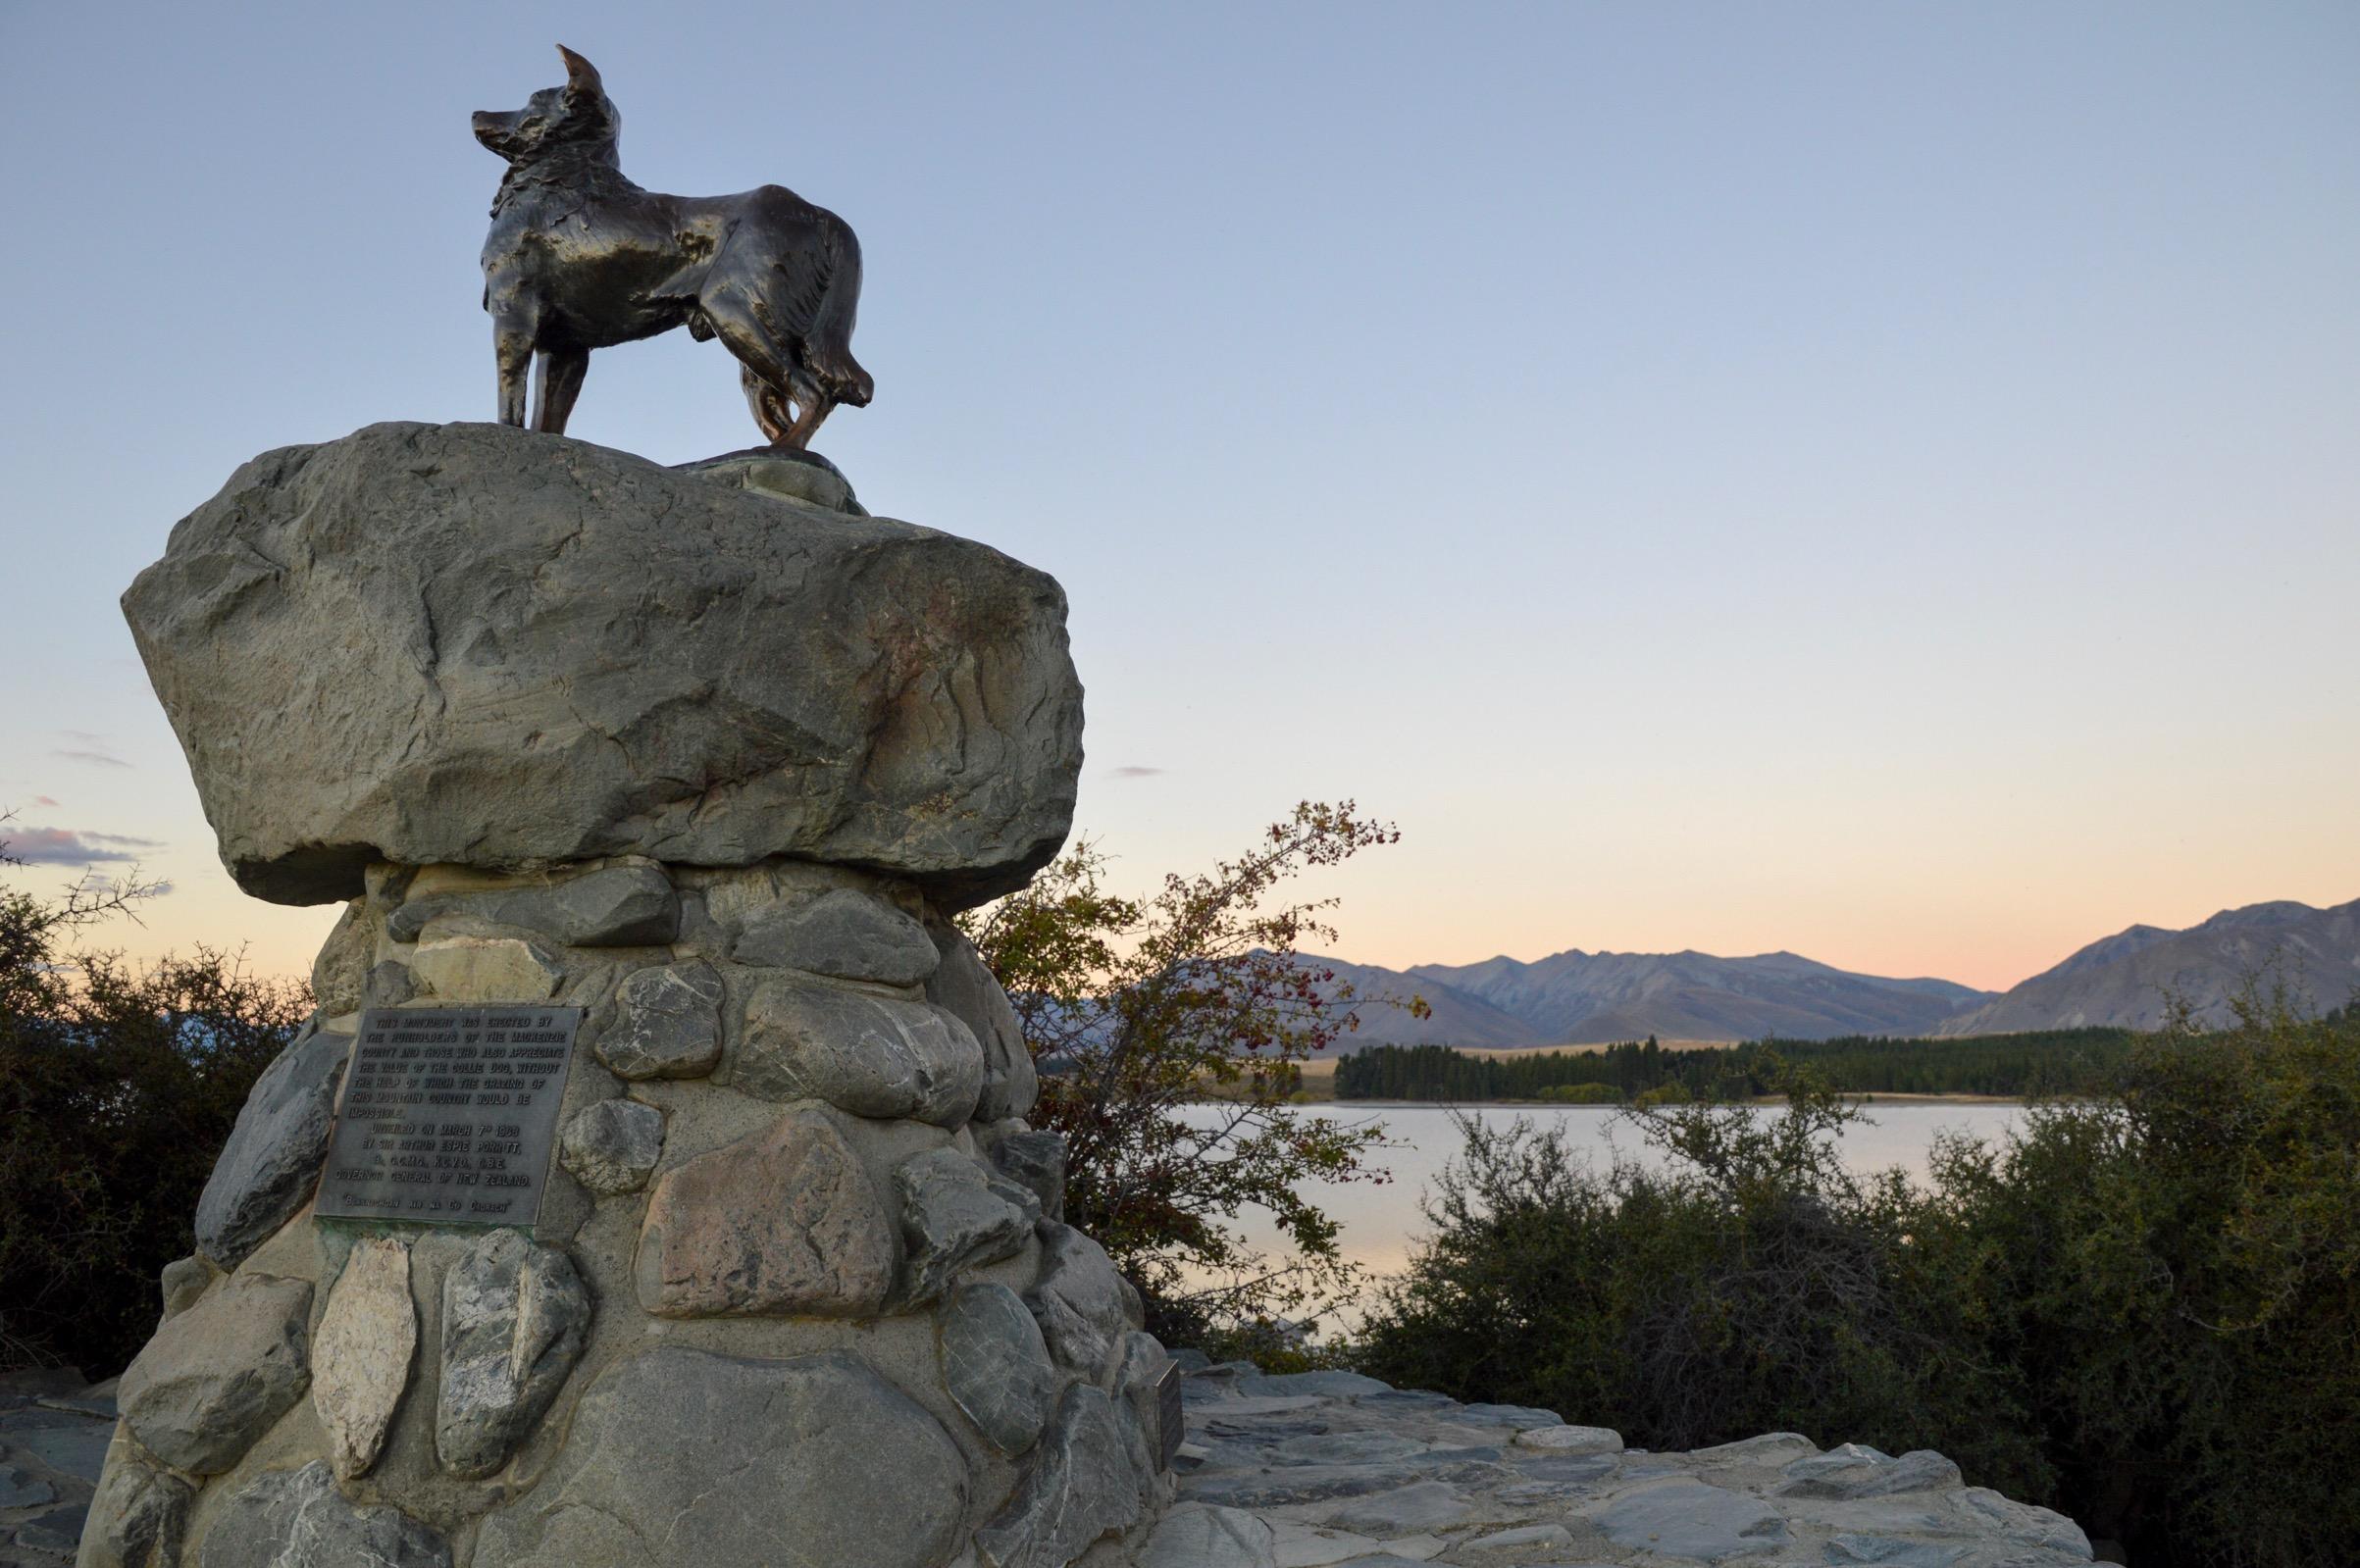 Mackenzie Sheepdog Statue, Lake Tekapo, New Zealand